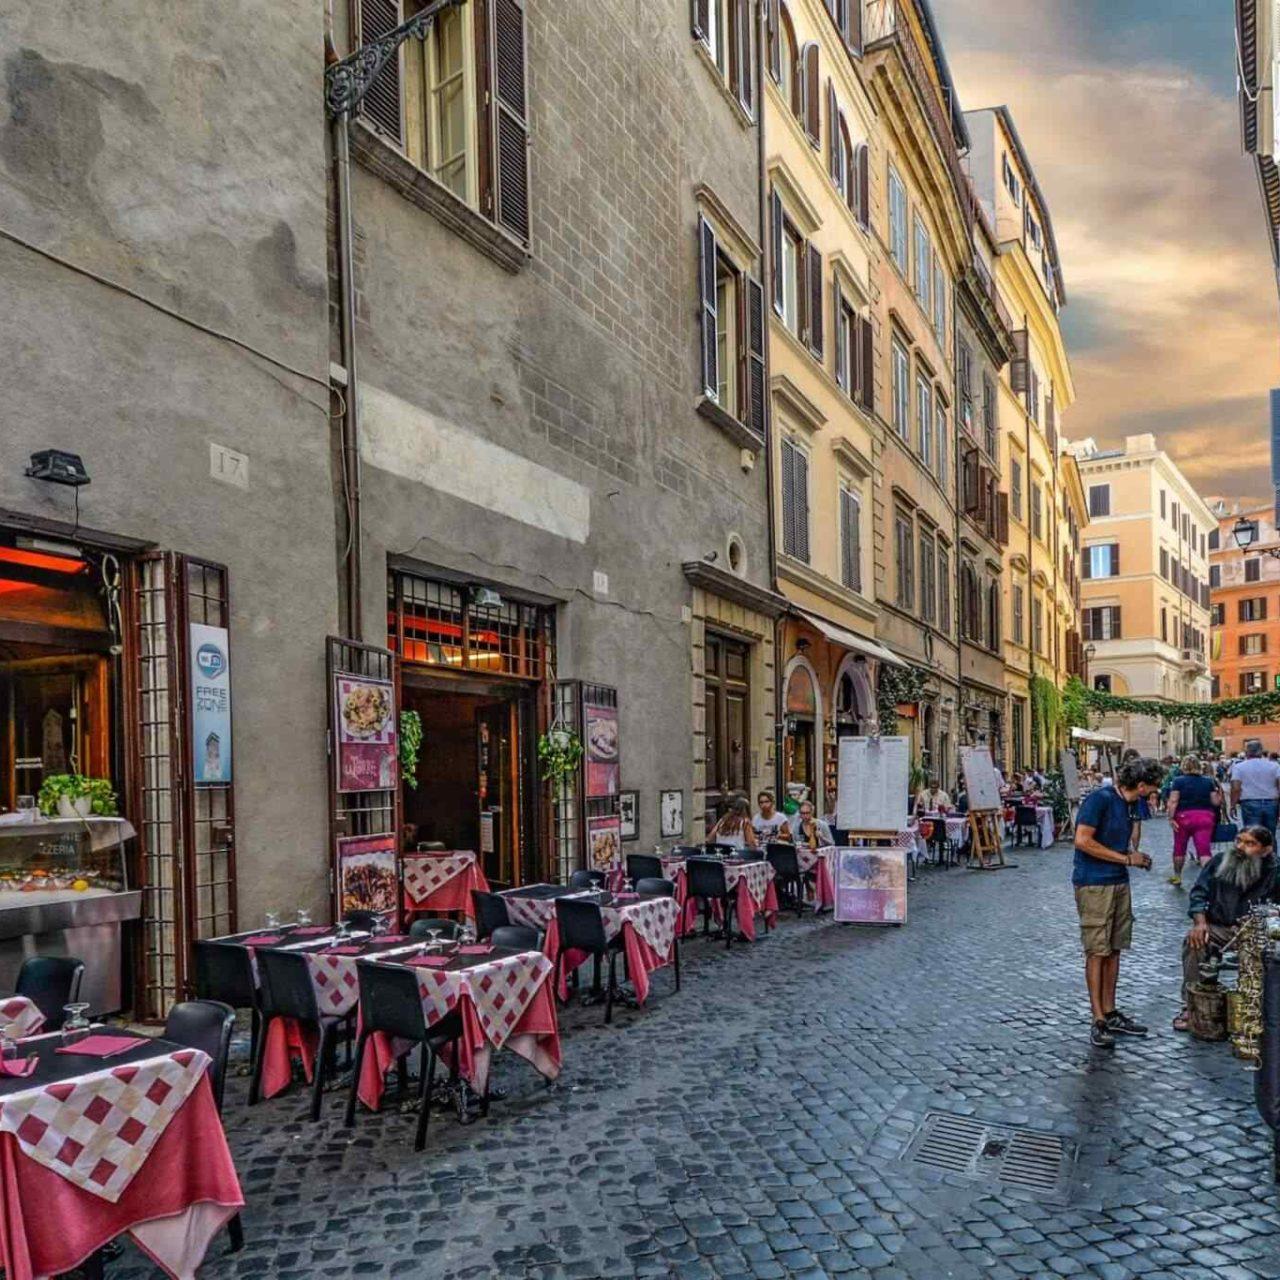 https://www.locfind.eu/wp-content/uploads/2017/10/restaurant-italian-6-1280x1280.jpg